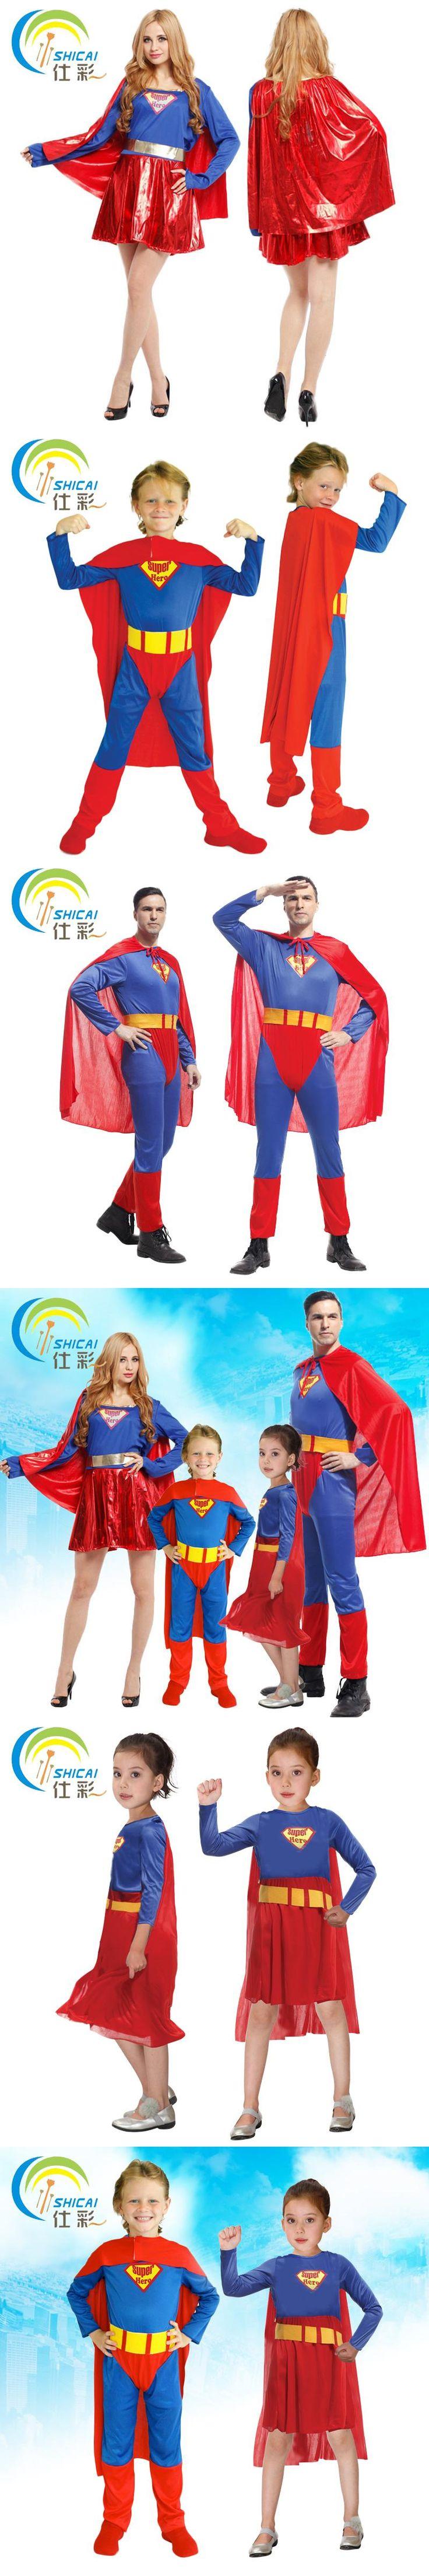 Free shipping heroic Superman suit adult men and women dance parties cosplay costume Halloween Christmas child superhero costume